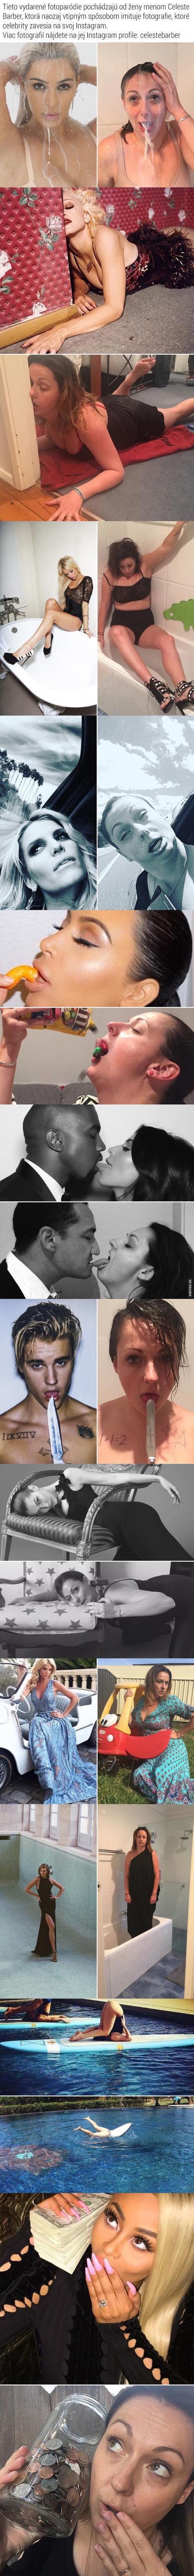 Žena dělá parodie na fotky celebrit